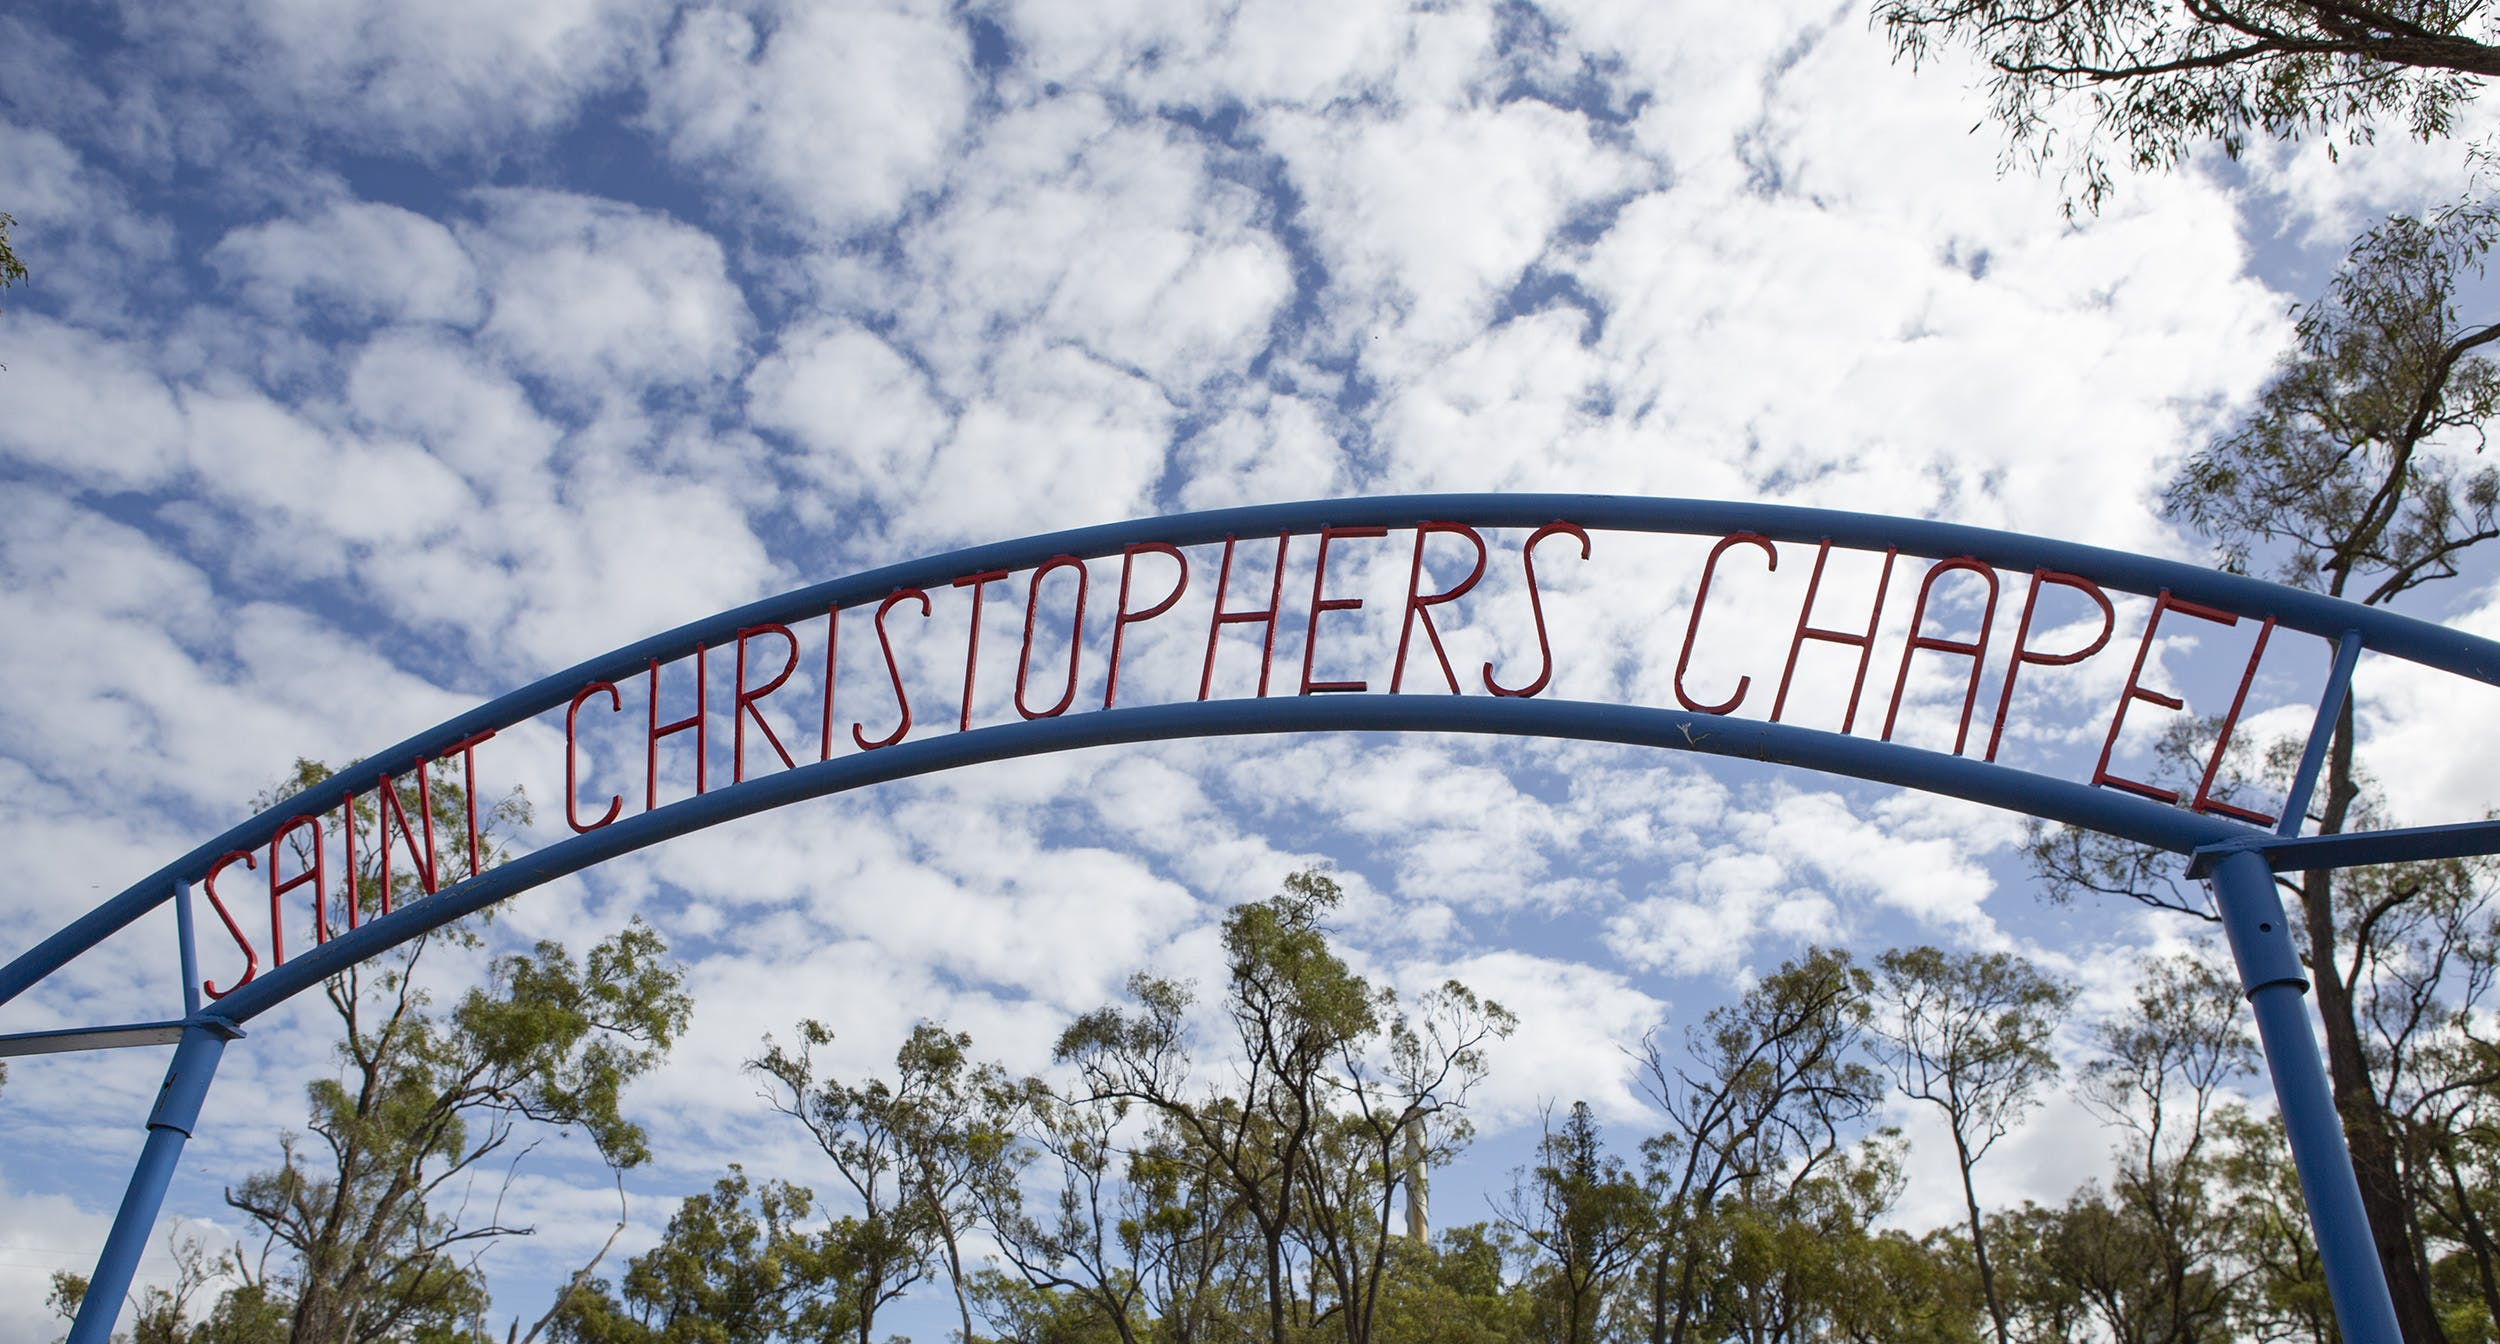 St Christophers 2019 - sign.jpg